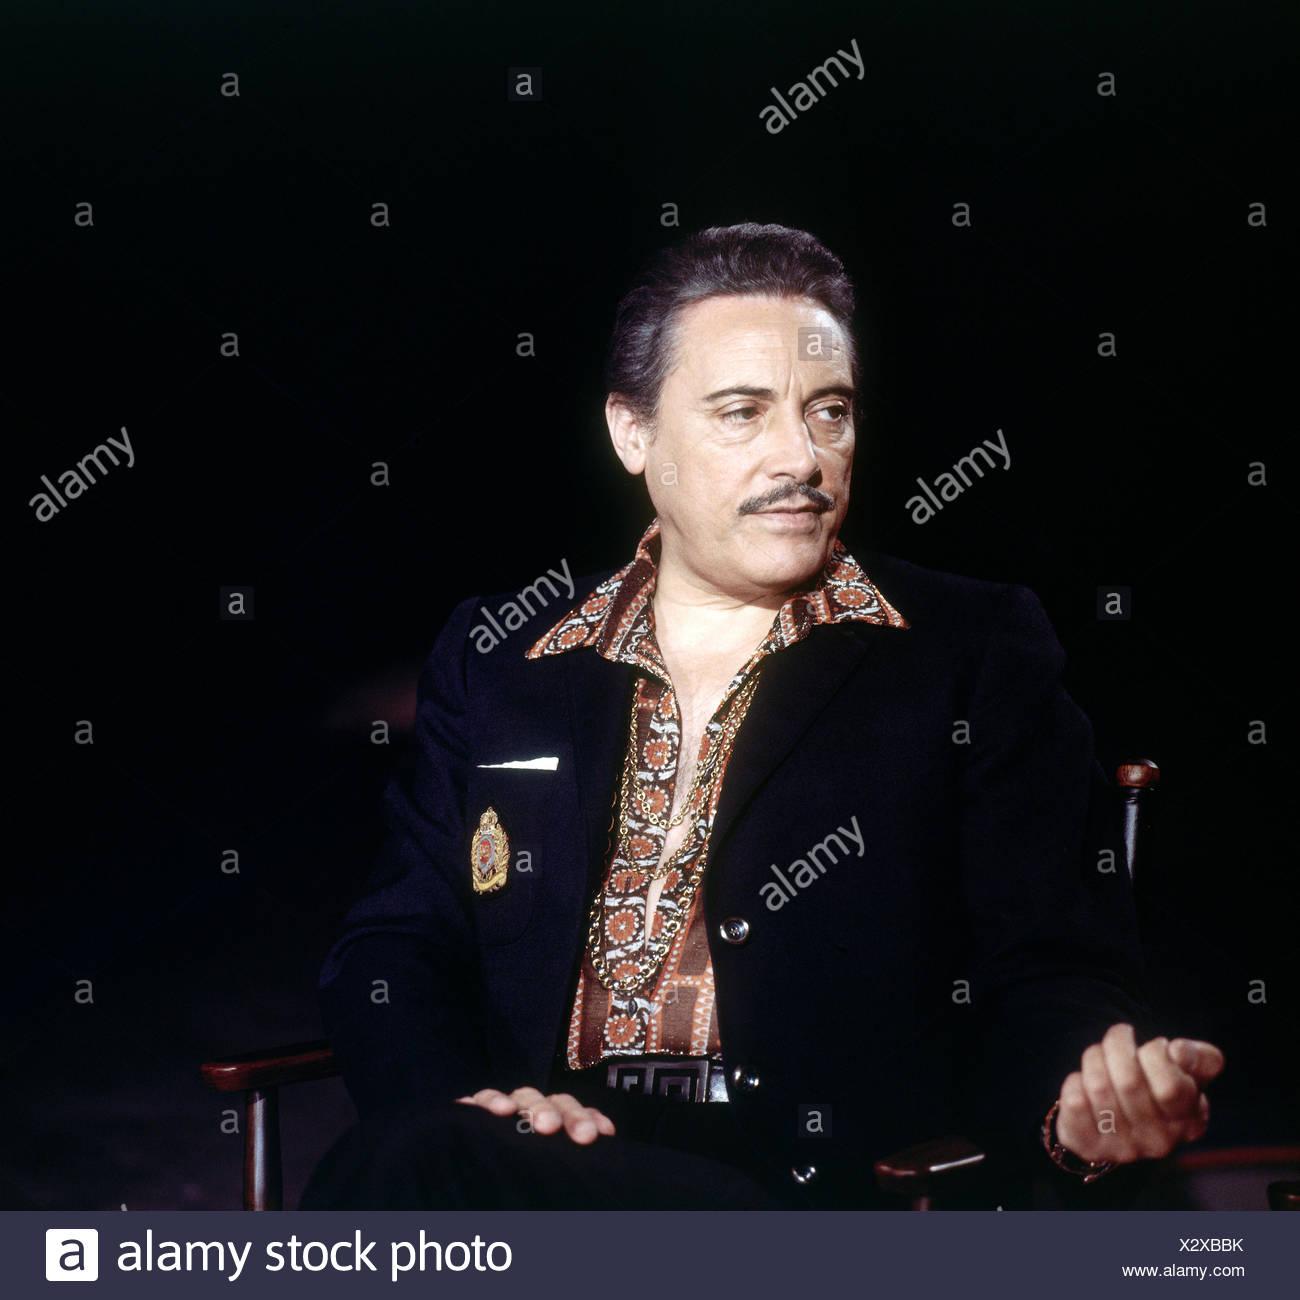 Monaco, Mario del, 27.7.1915 - 16.10.1982, Italian singer (tenor), half length, at rehearsal for ARD television program, 16.5.1973, Additional-Rights-Clearances-NA - Stock Image